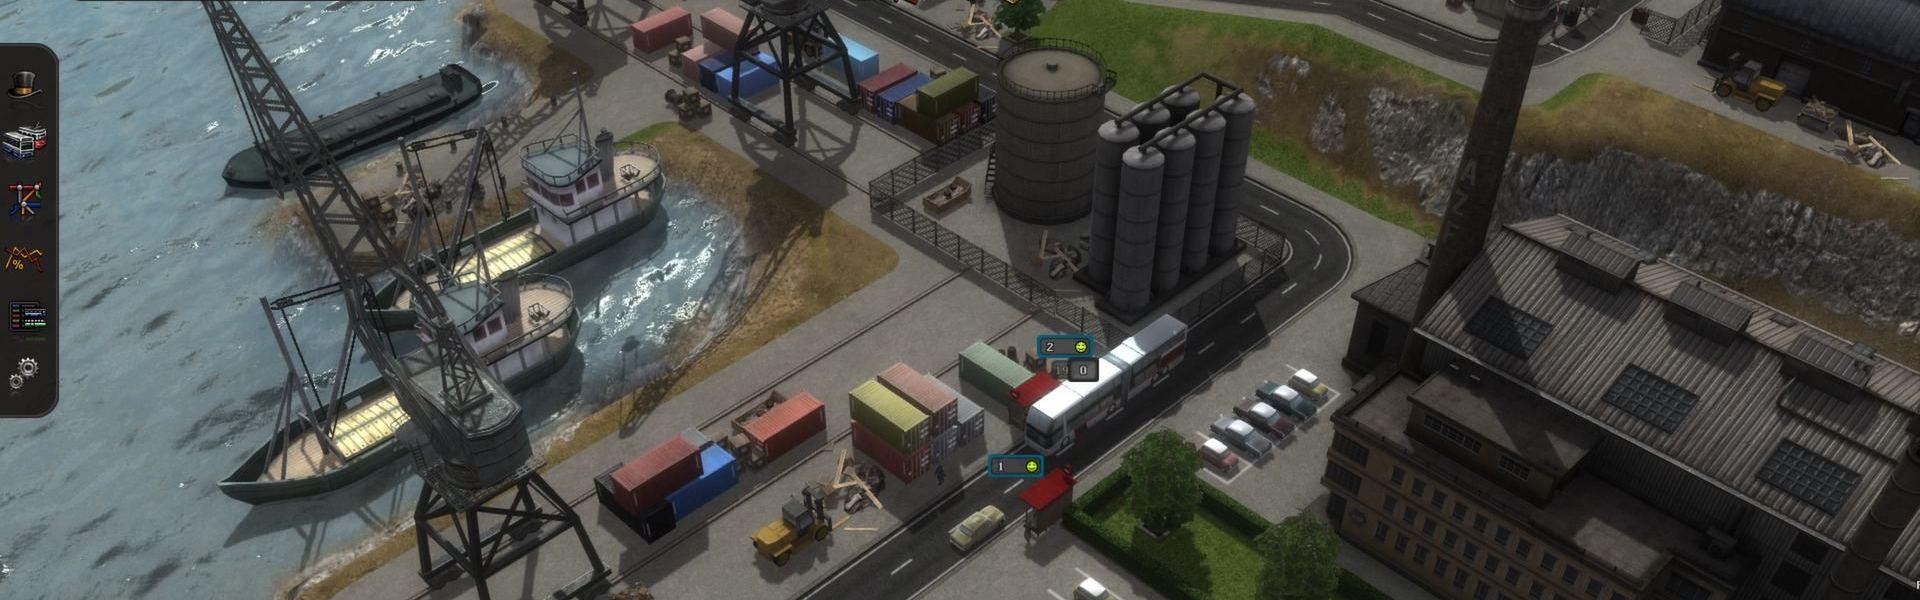 Cities in Motion - Ulm (DLC) Steam Key GLOBAL